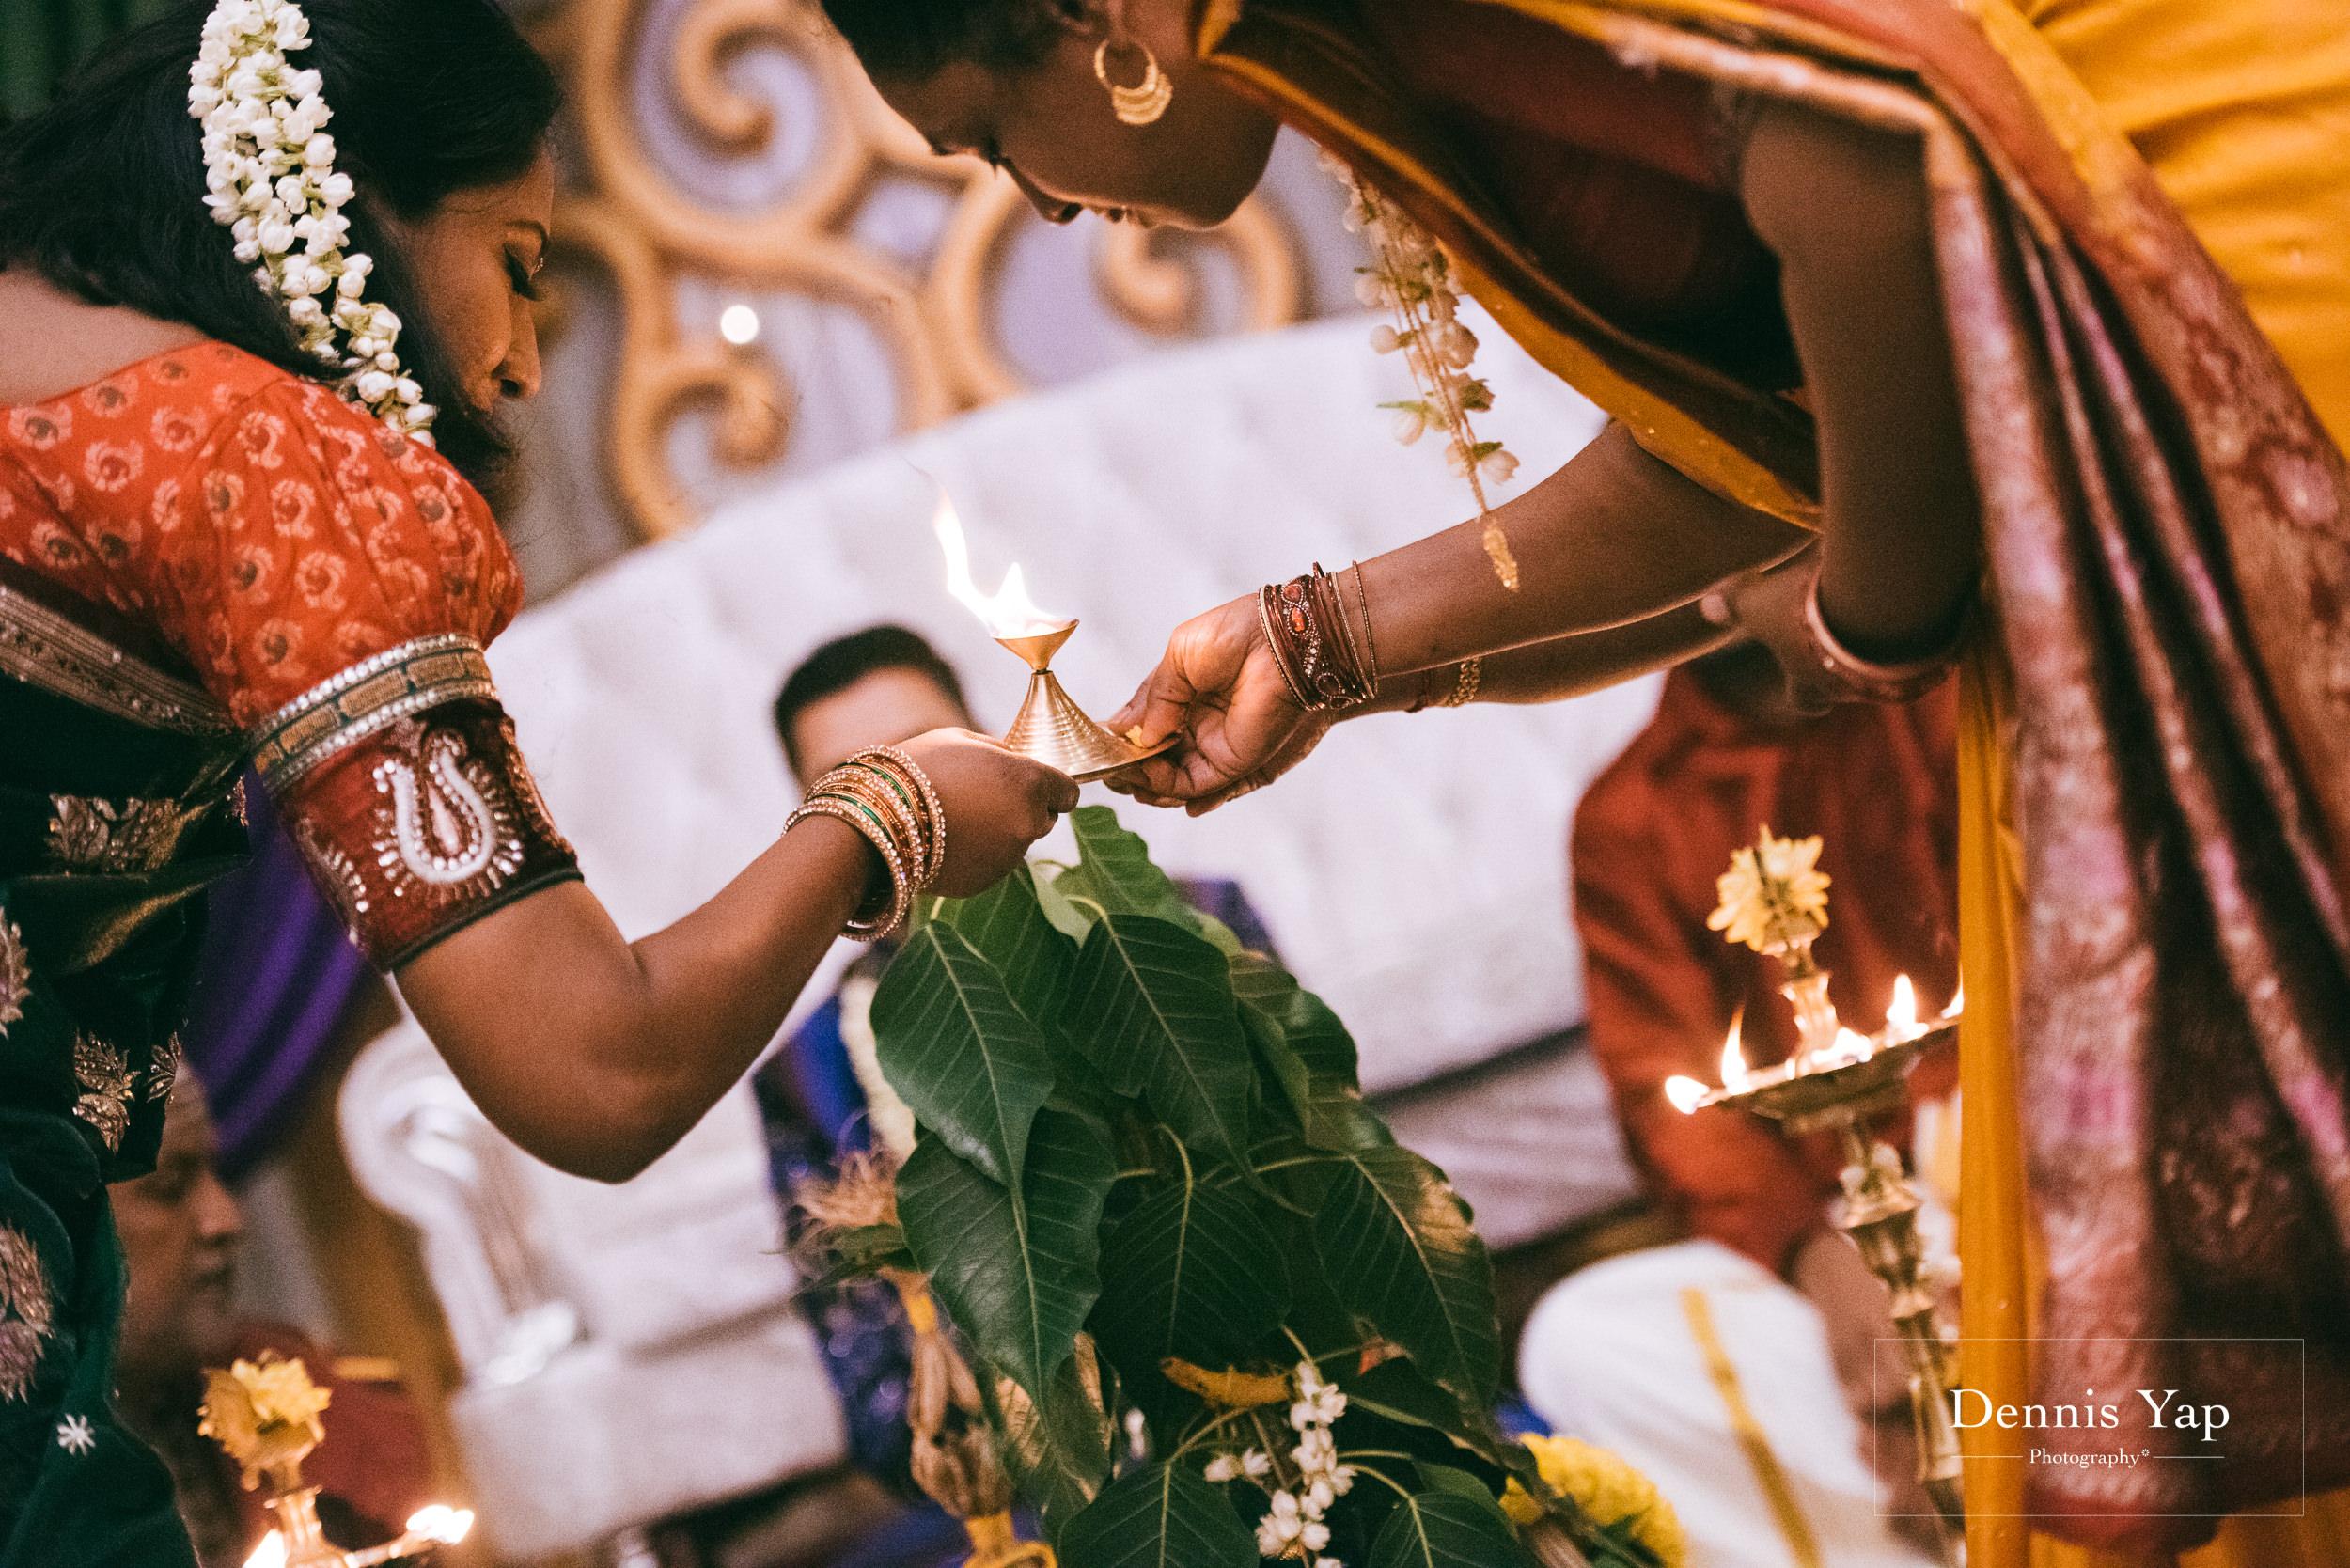 puvaneswaran cangitaa indian wedding ceremony ideal convention dennis yap photography malaysia-13.jpg